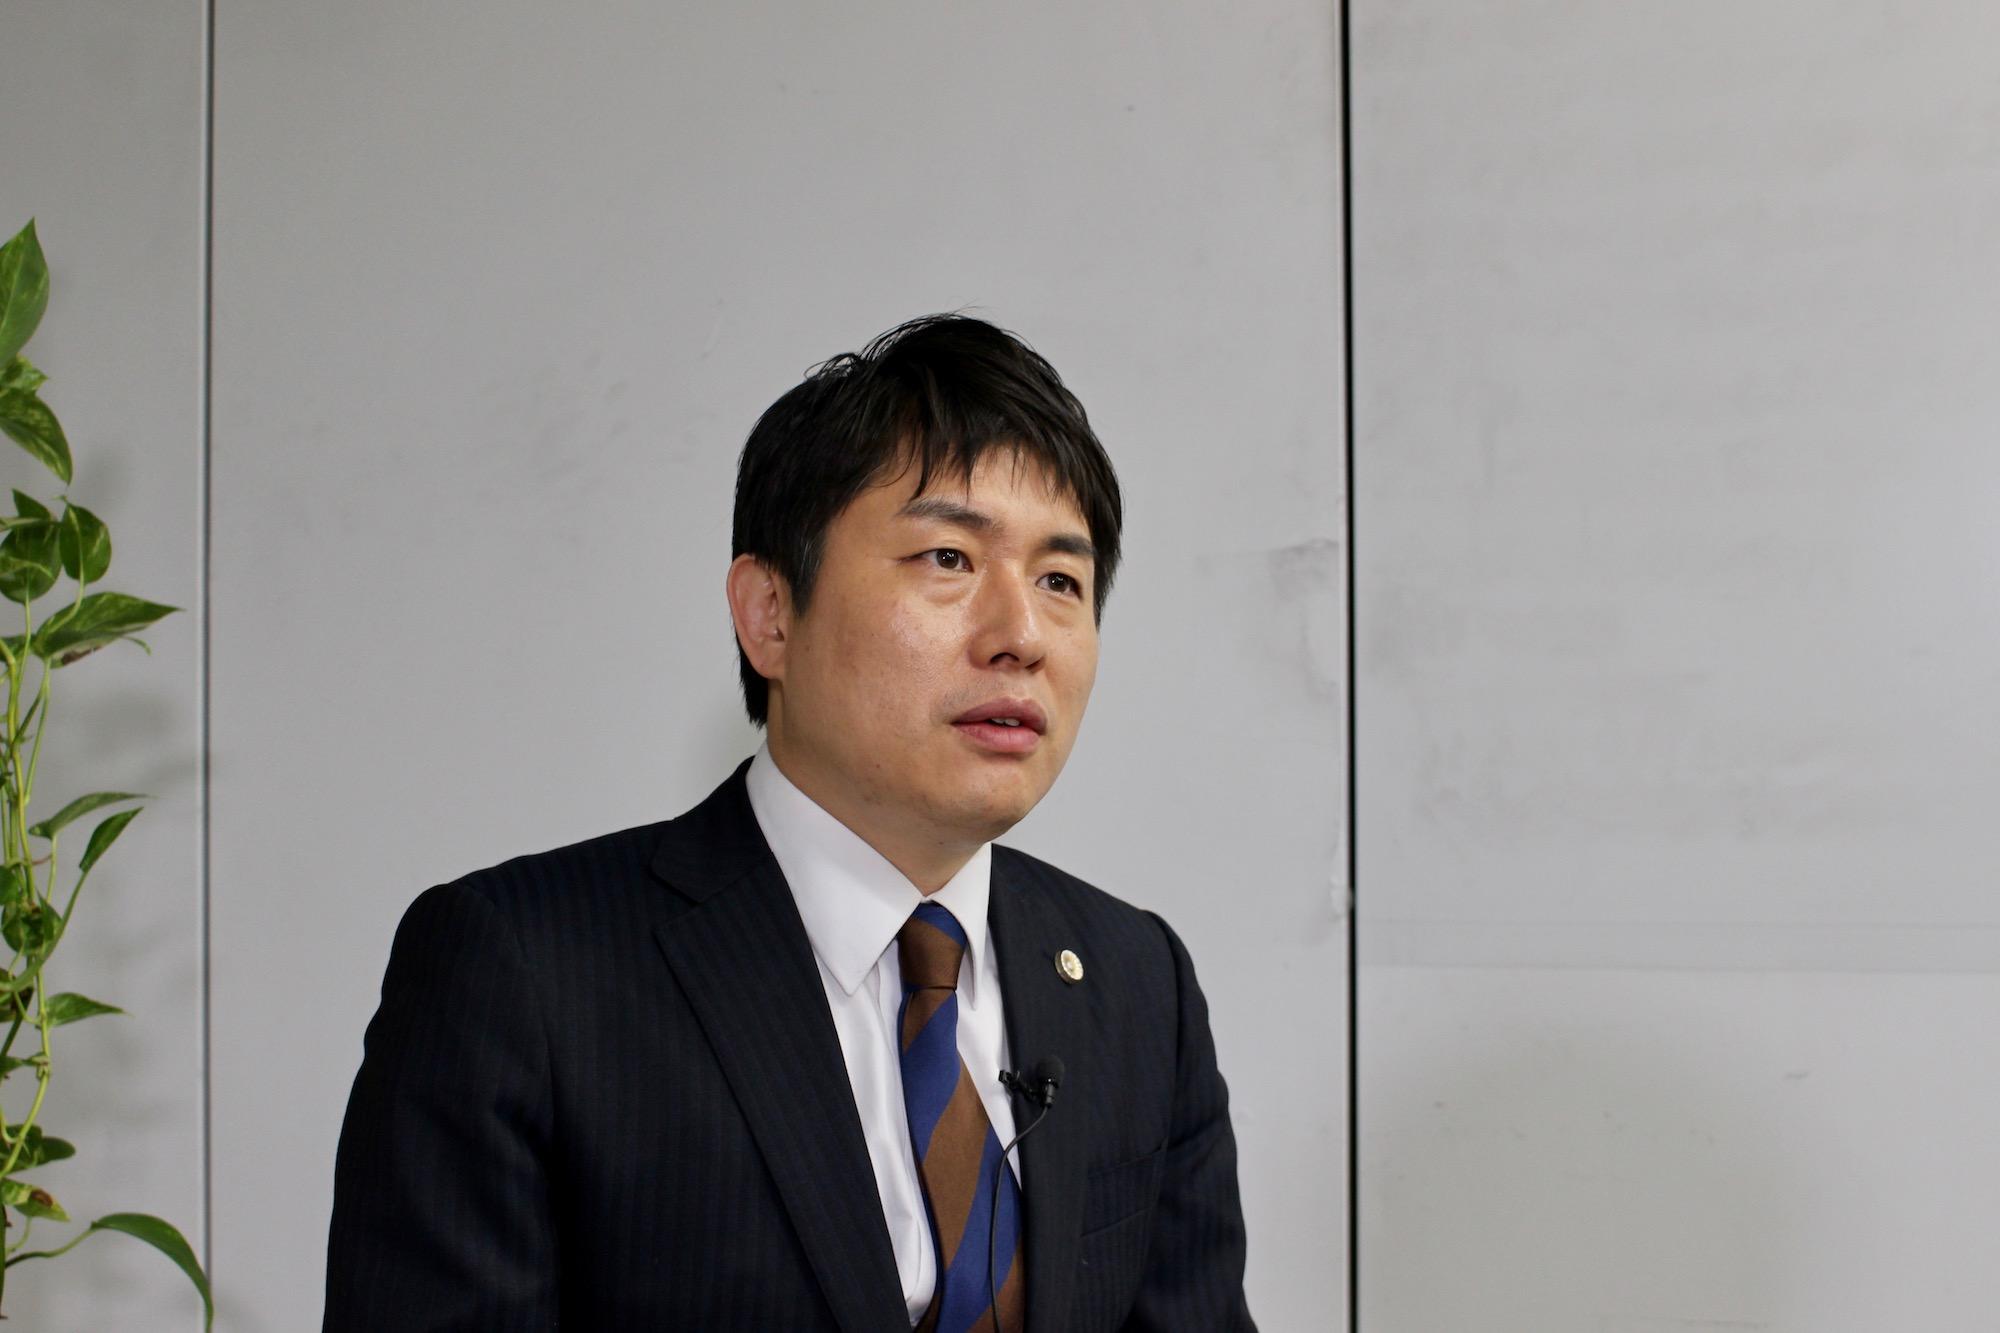 Minami07